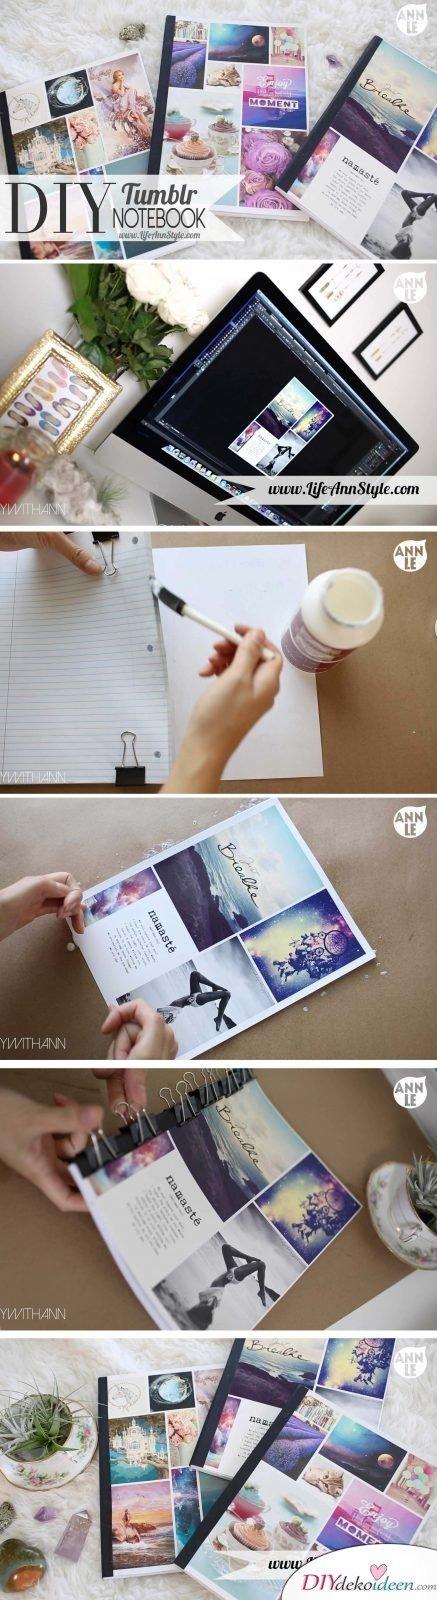 DIY Notizbuch Anleitung Schritt für Schritt